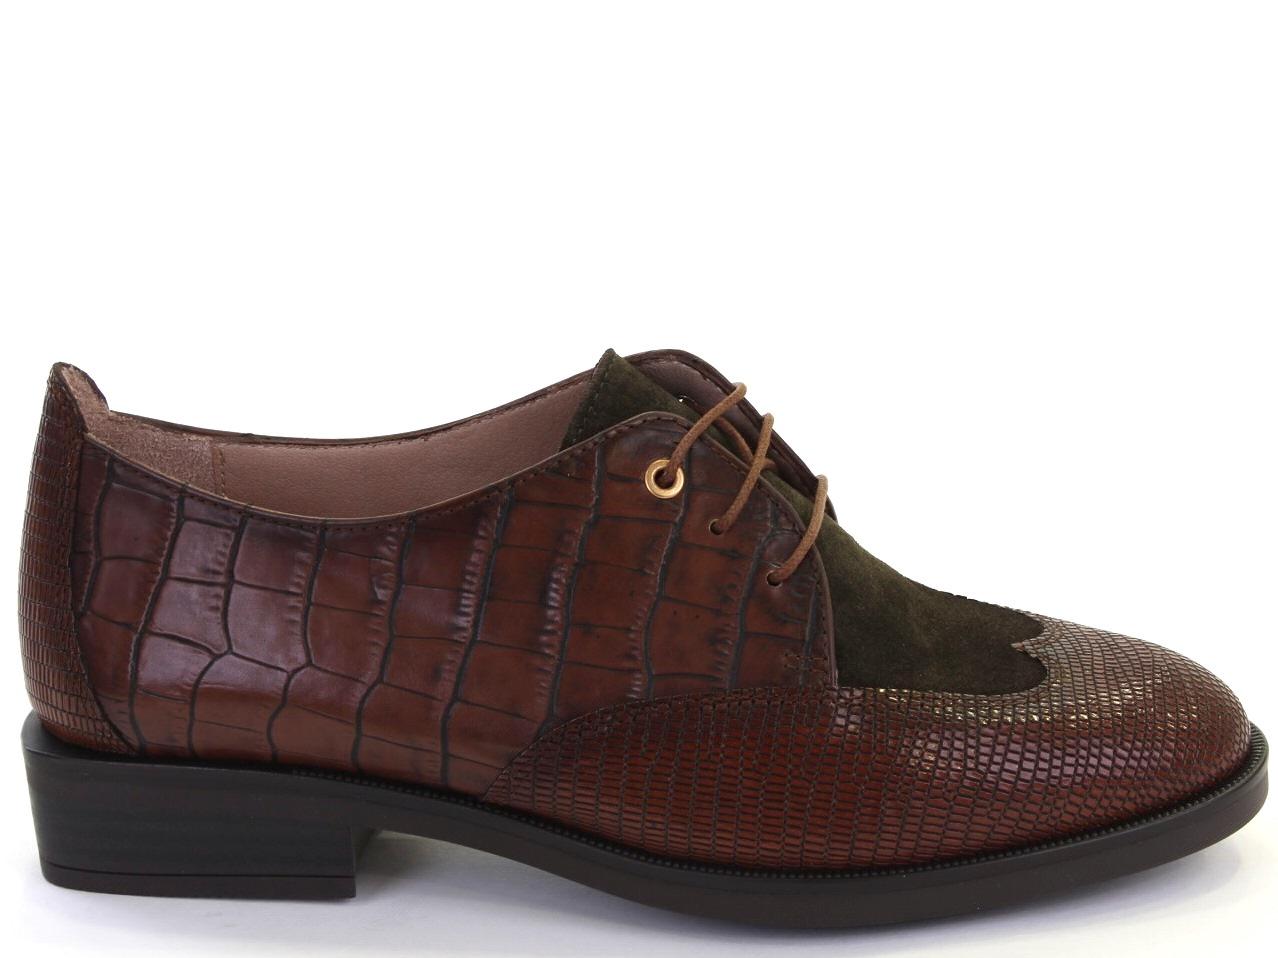 Flat Shoes, Ballerinas, Mocassins Hispanitas - 165 HI00481